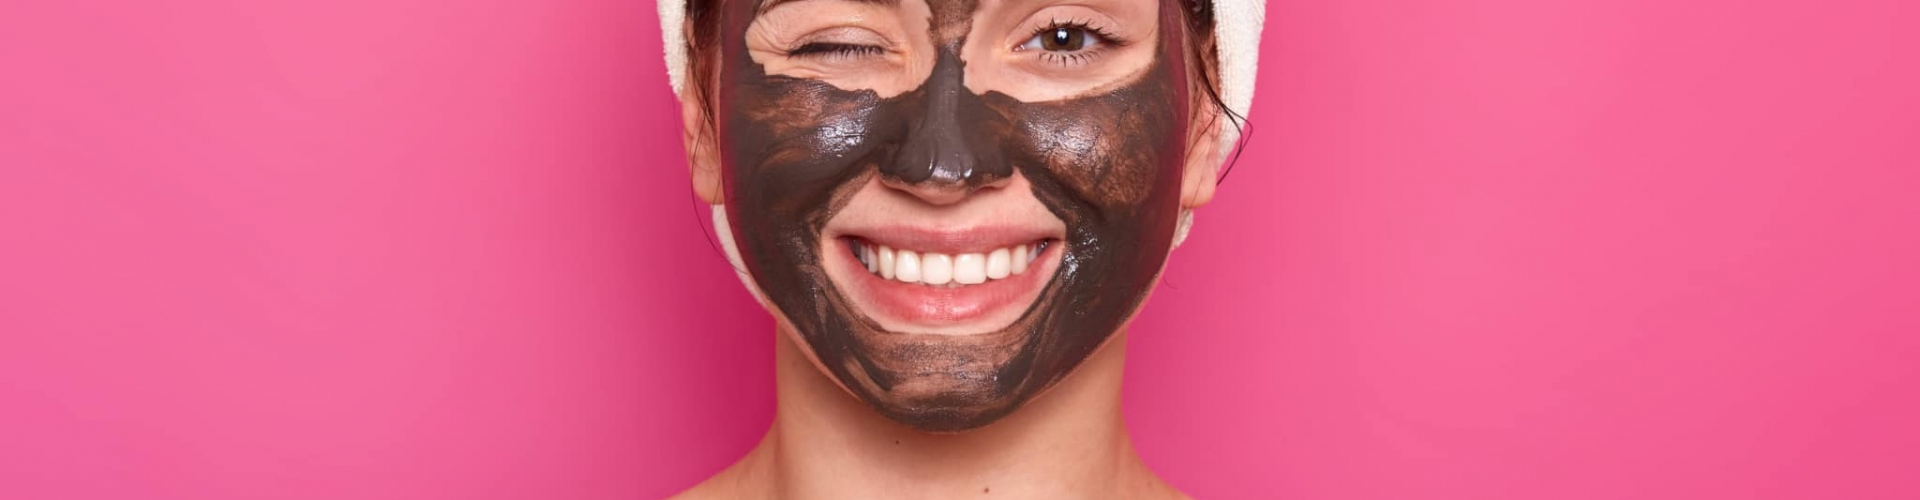 femme routine beauté masque anti imperfections